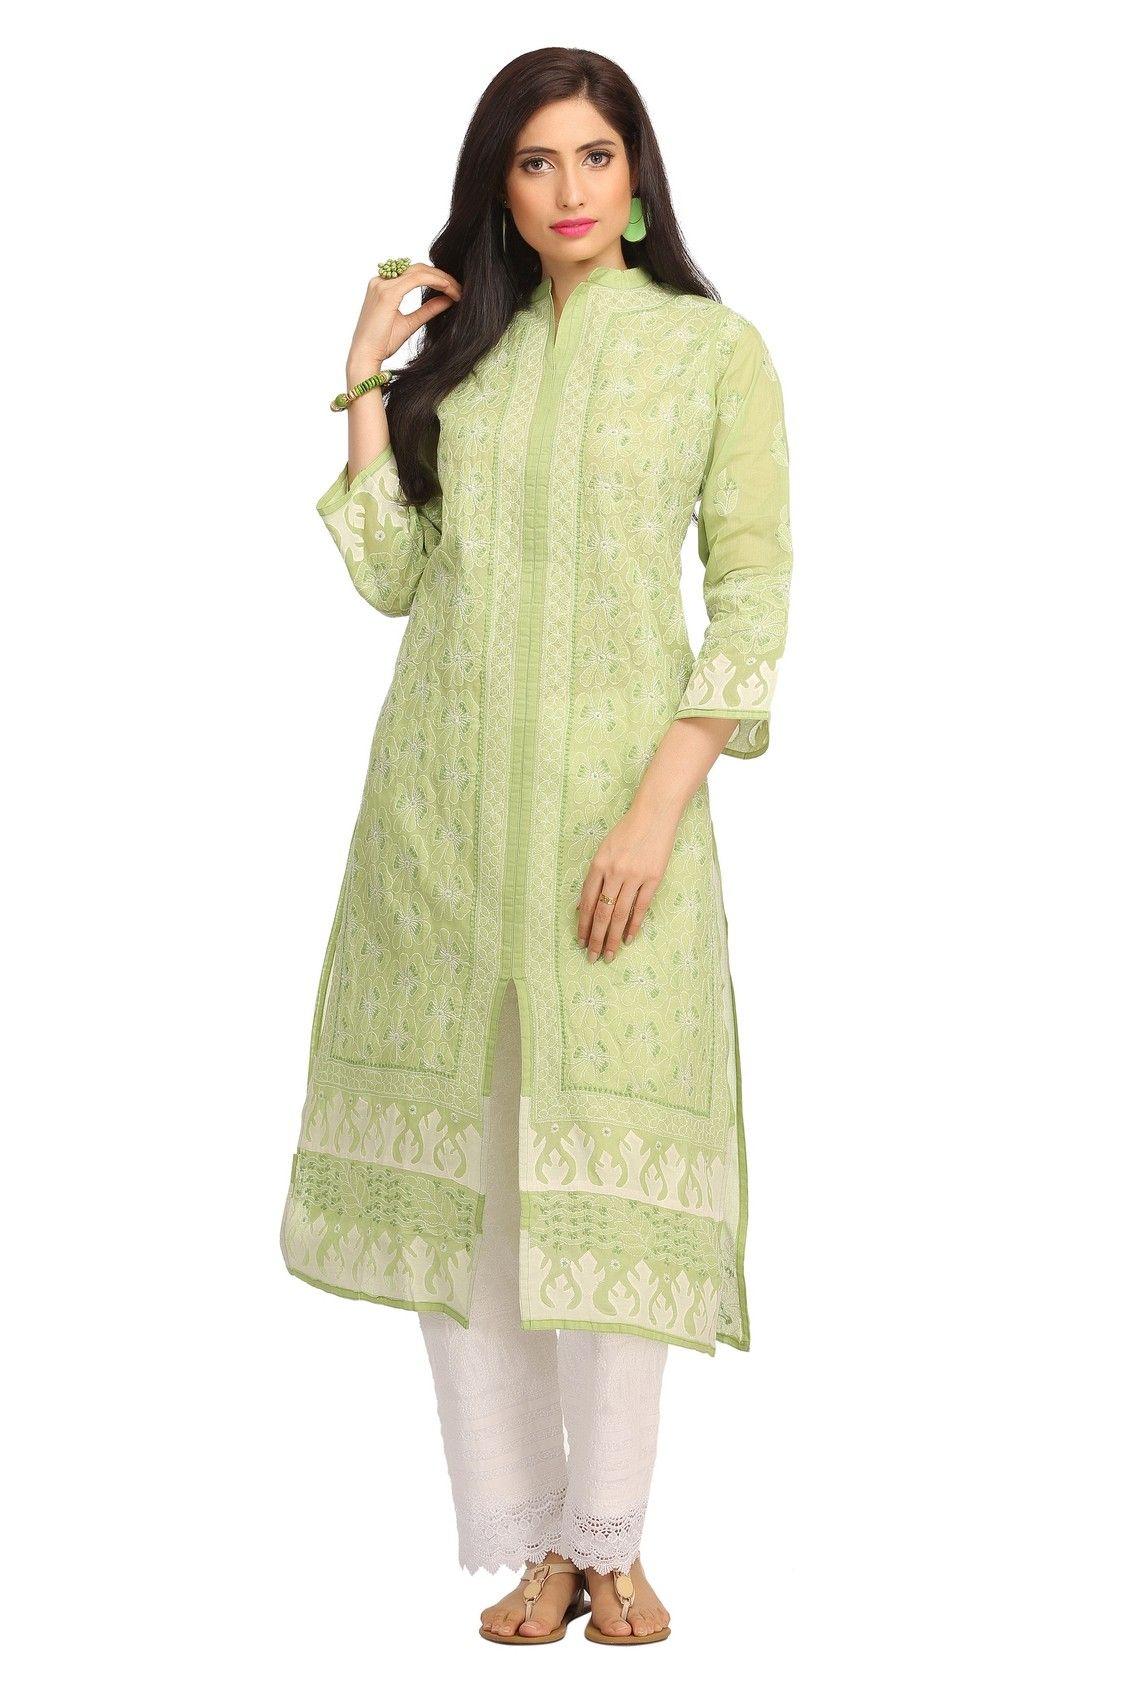 3b3b894aec Ada Hand Embroidered Green Cotton Lucknowi Chikankari Kurti-A118339 ...